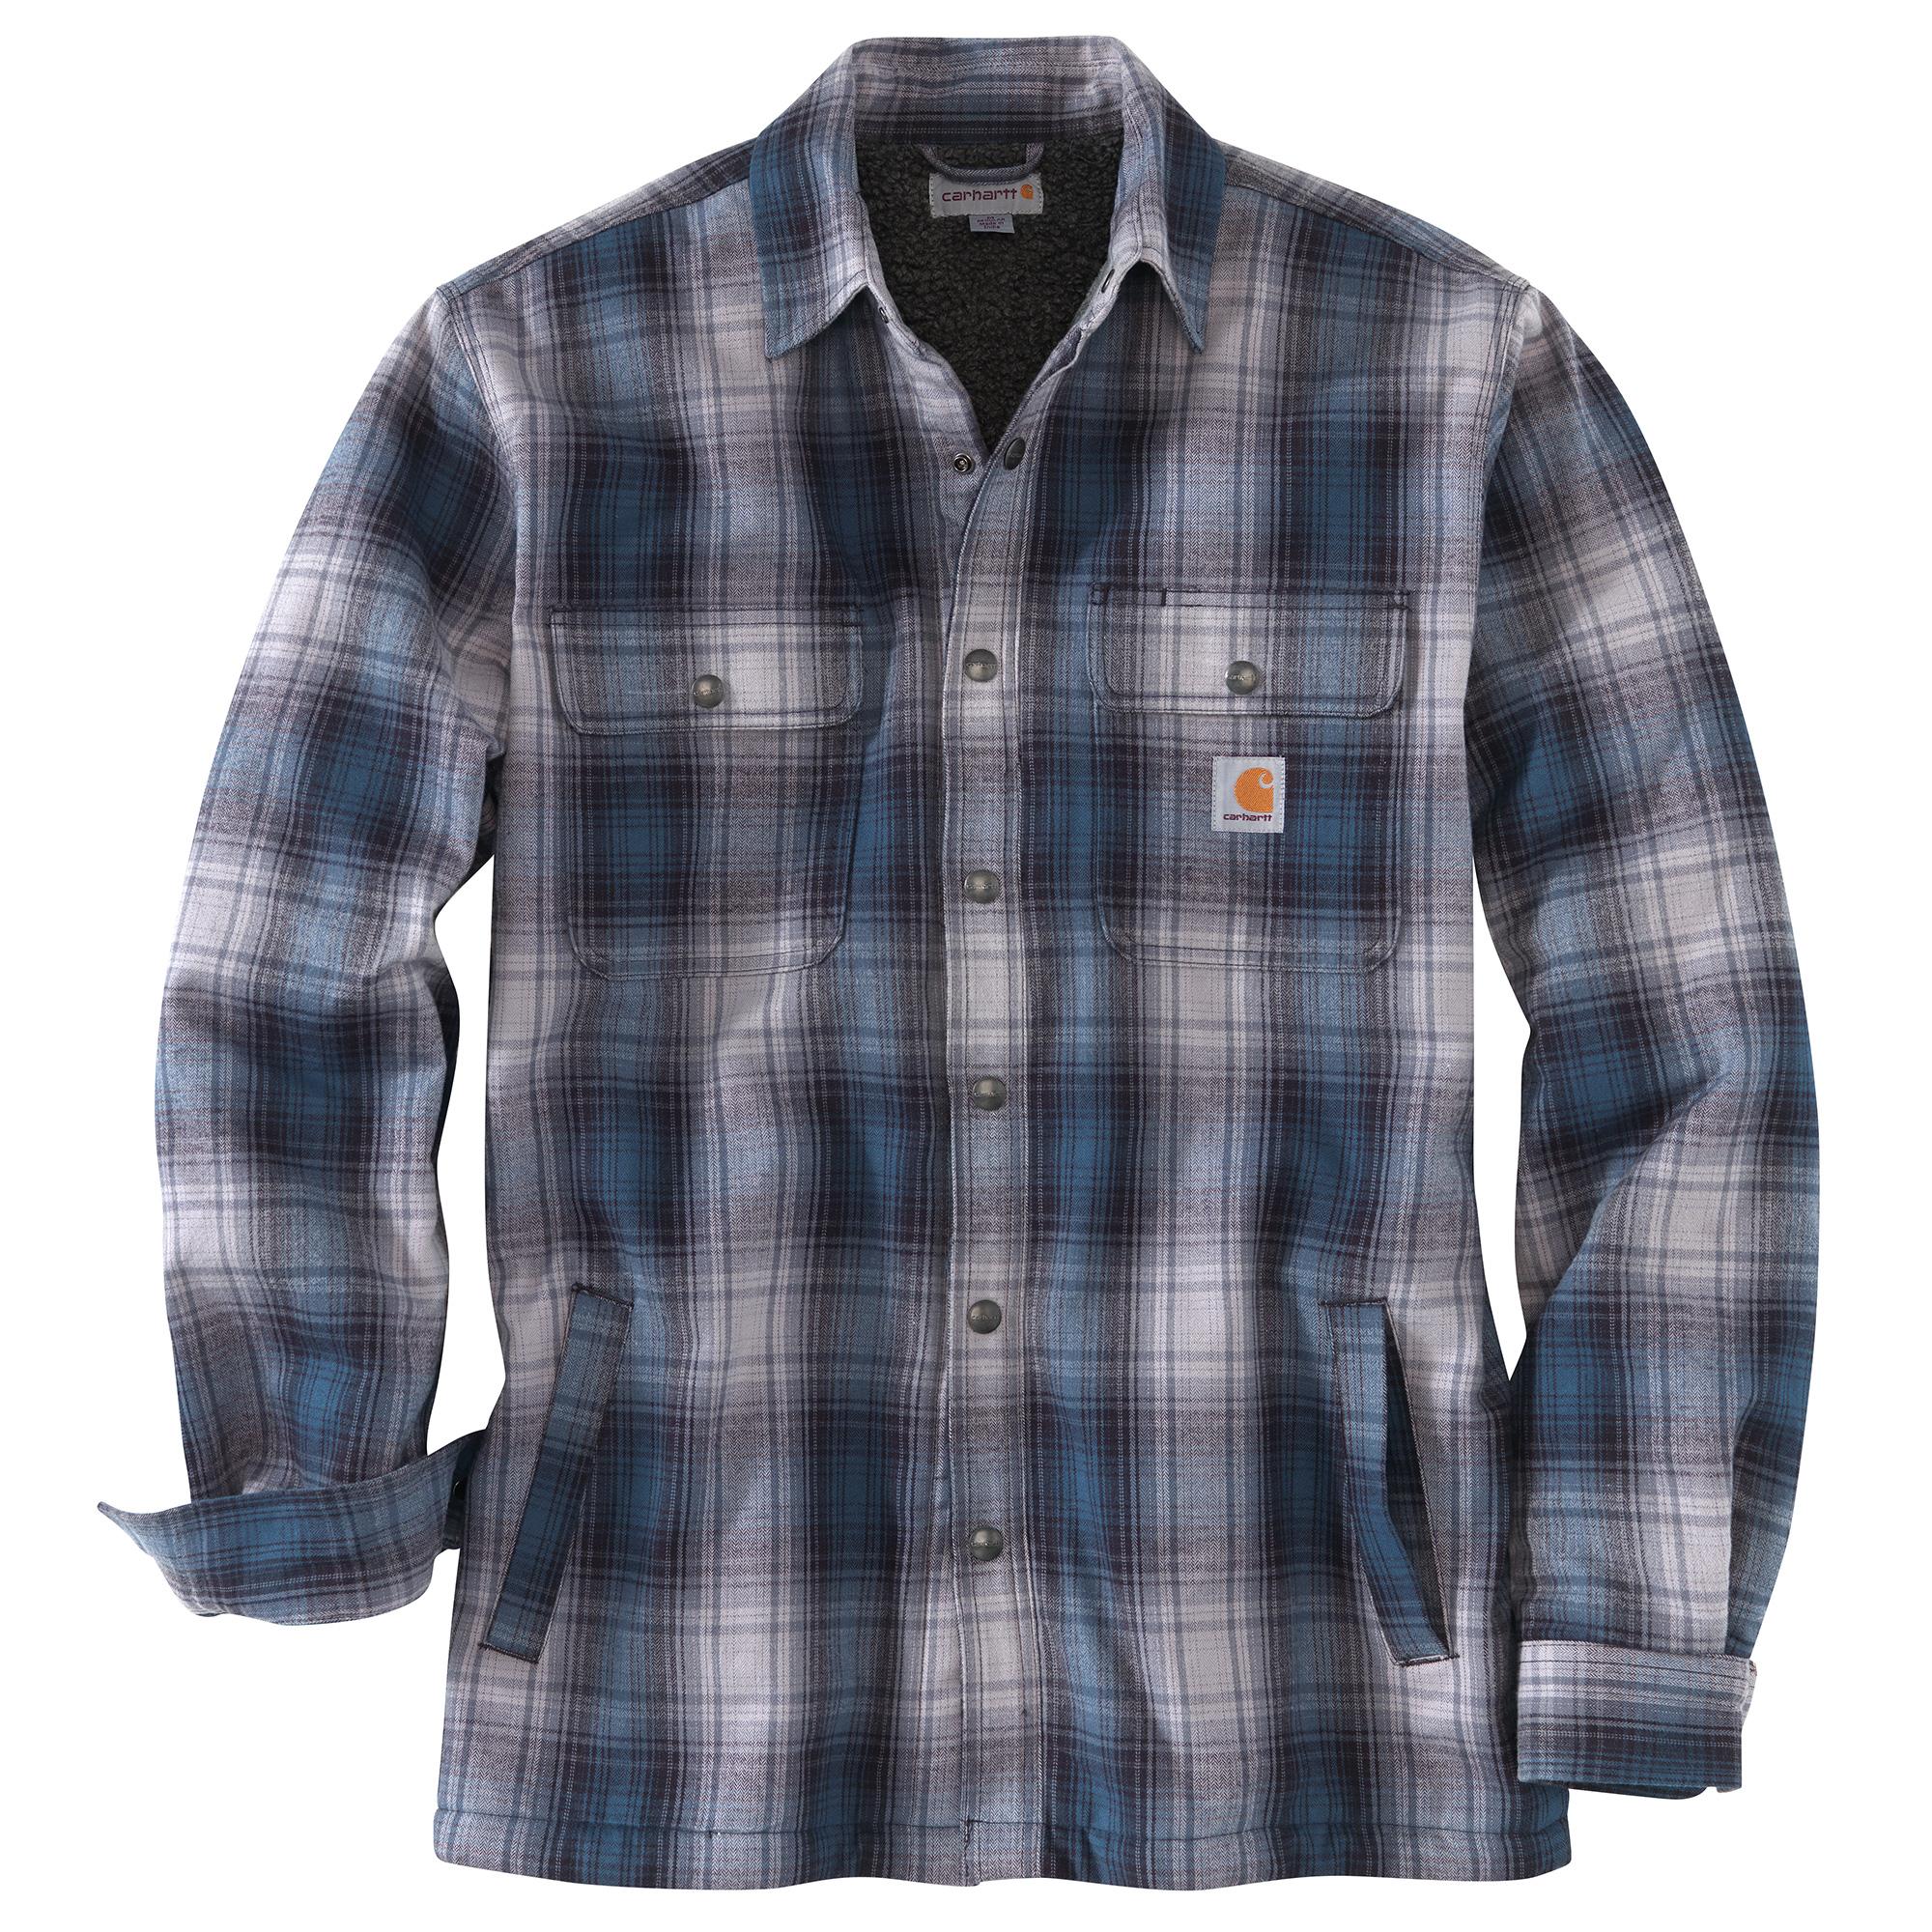 Carhartt Hubbard Sherpa Lined Shirt Jacket Men's